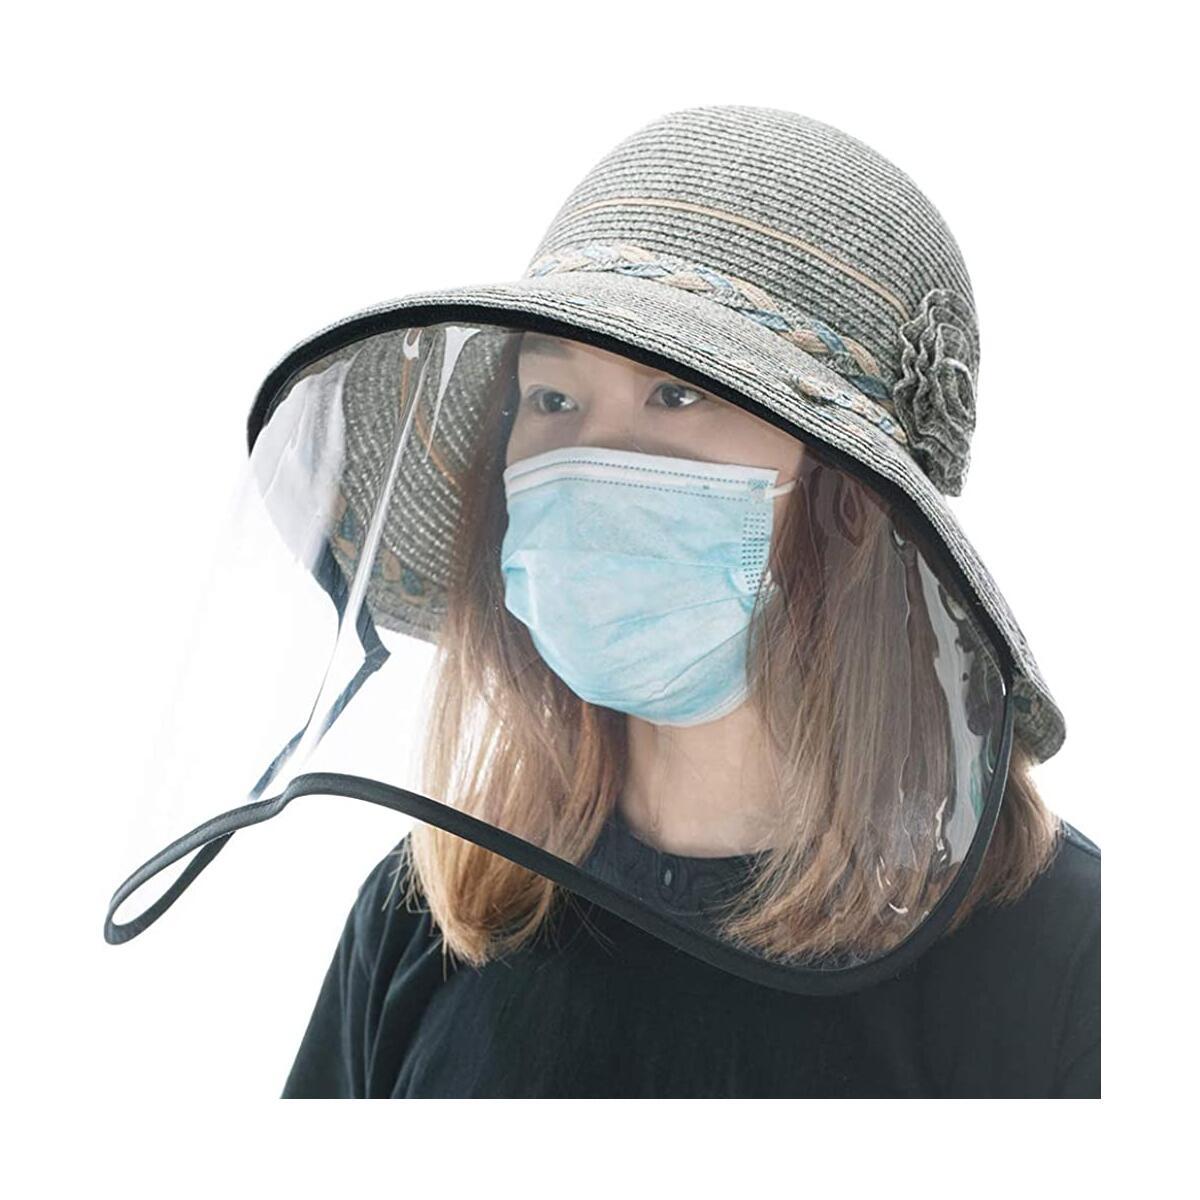 Fancet Womens Wide Brim Packable Straw Summer Sun Hat with Transparent Shield Safari Hiking Bonnie Blue